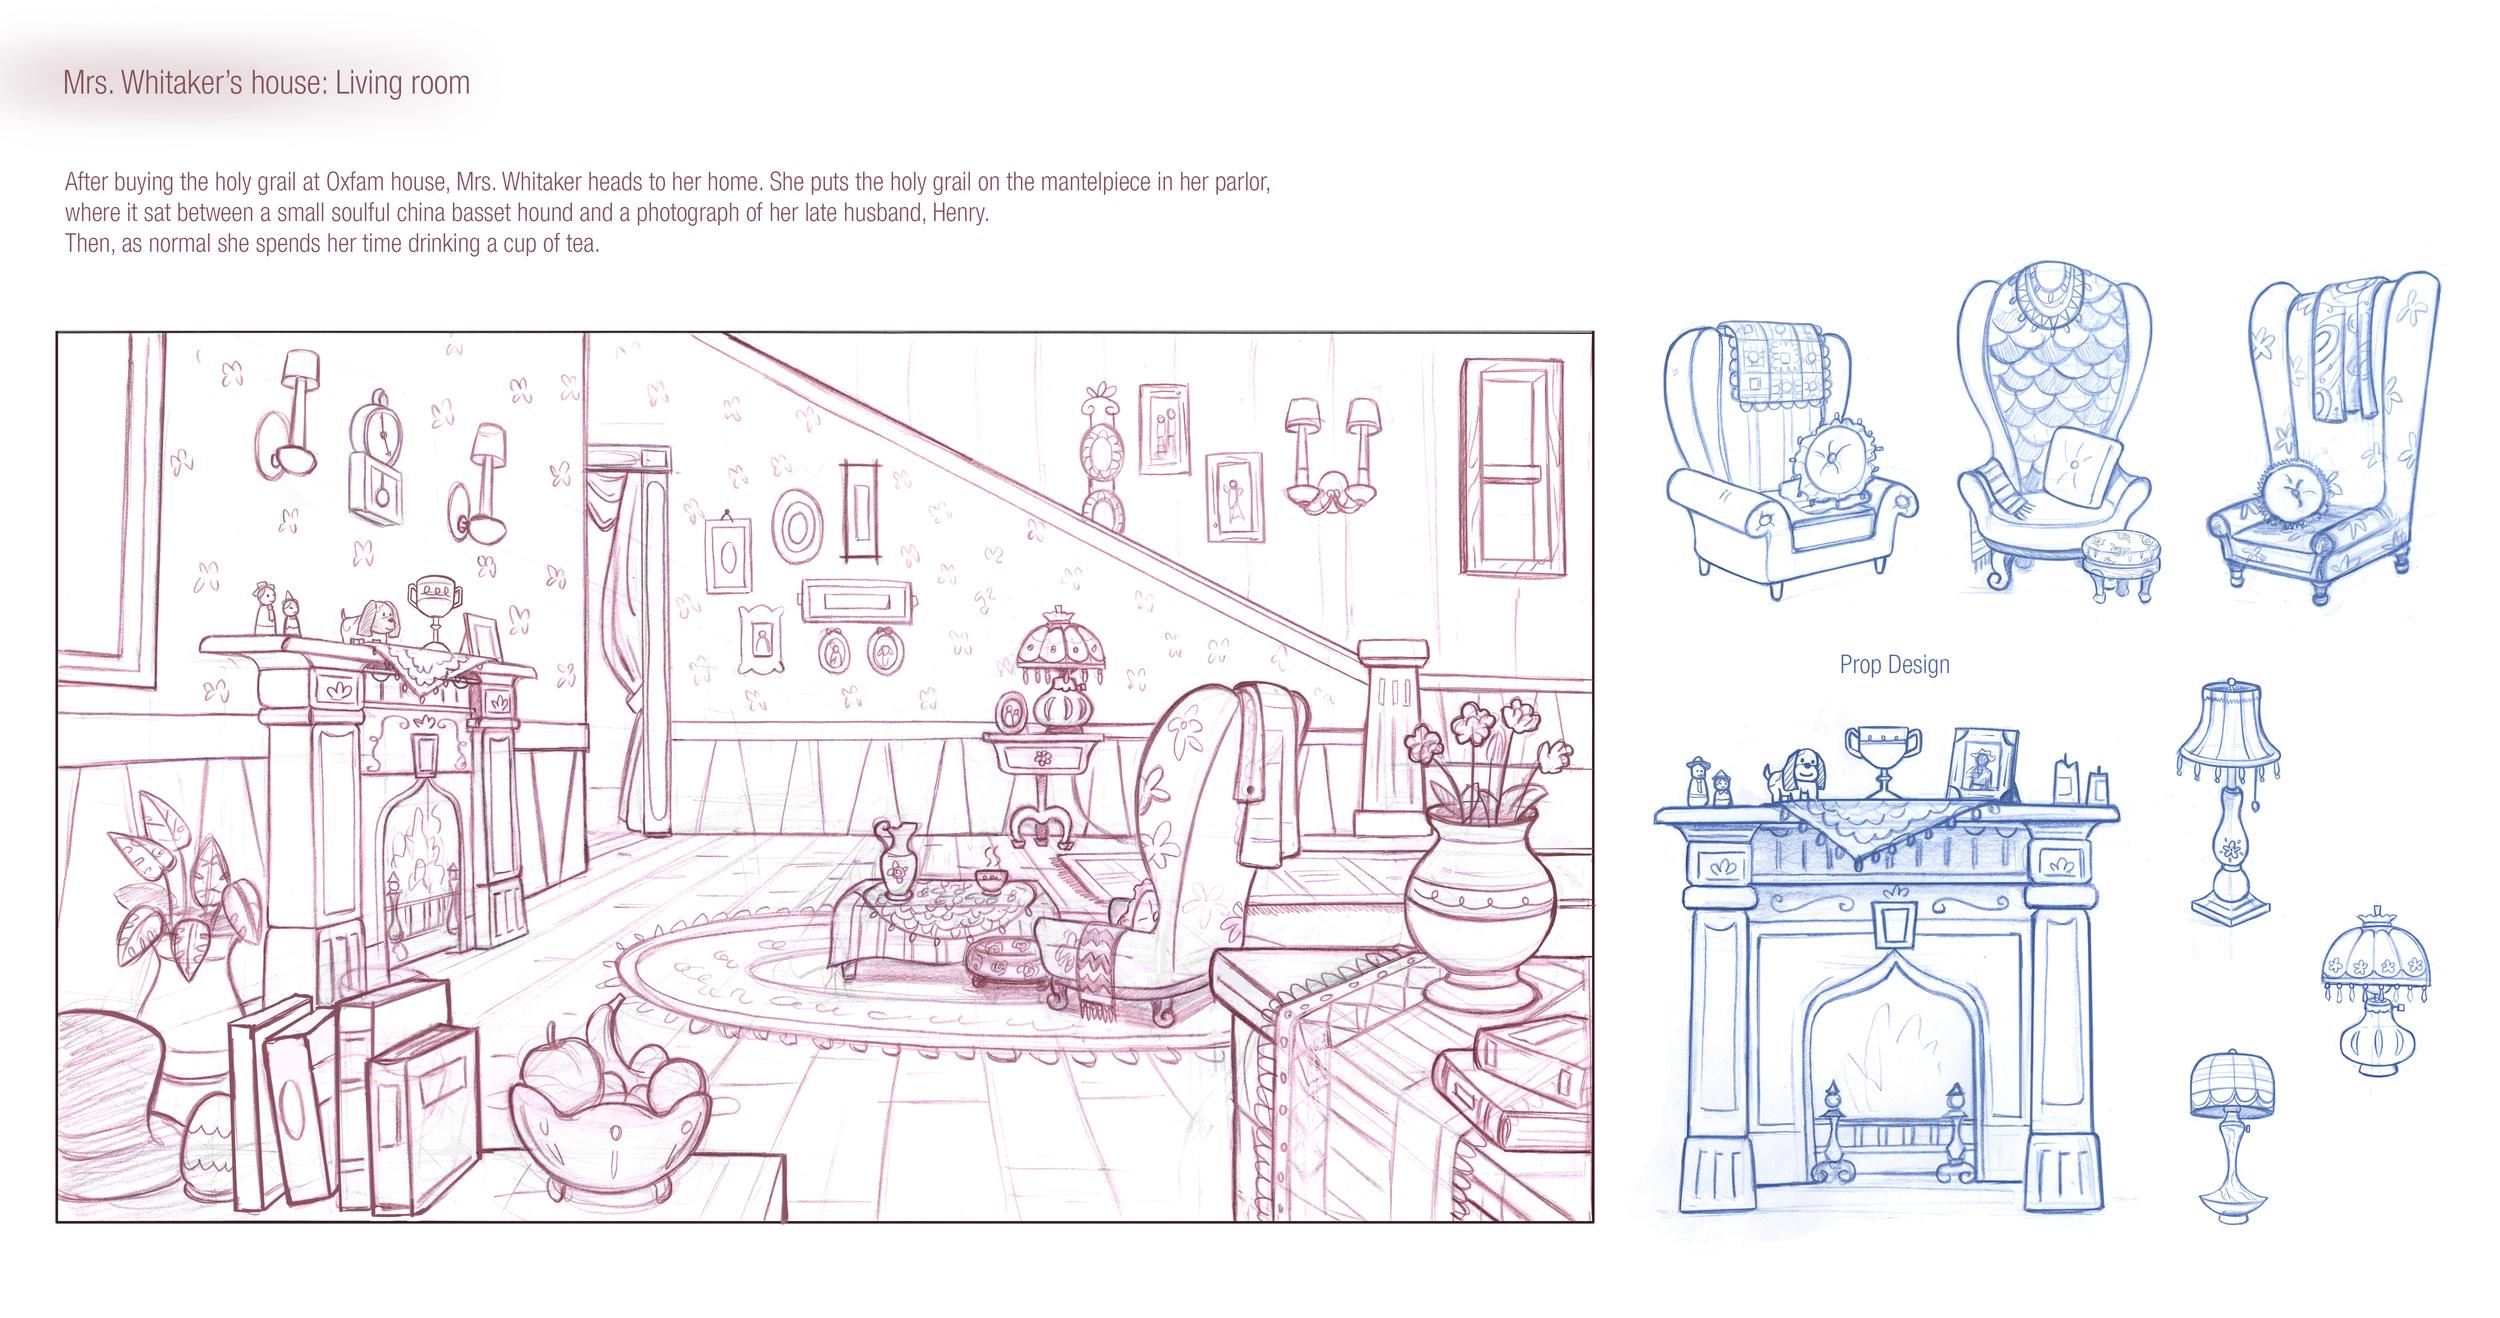 House interior design and prop studies.